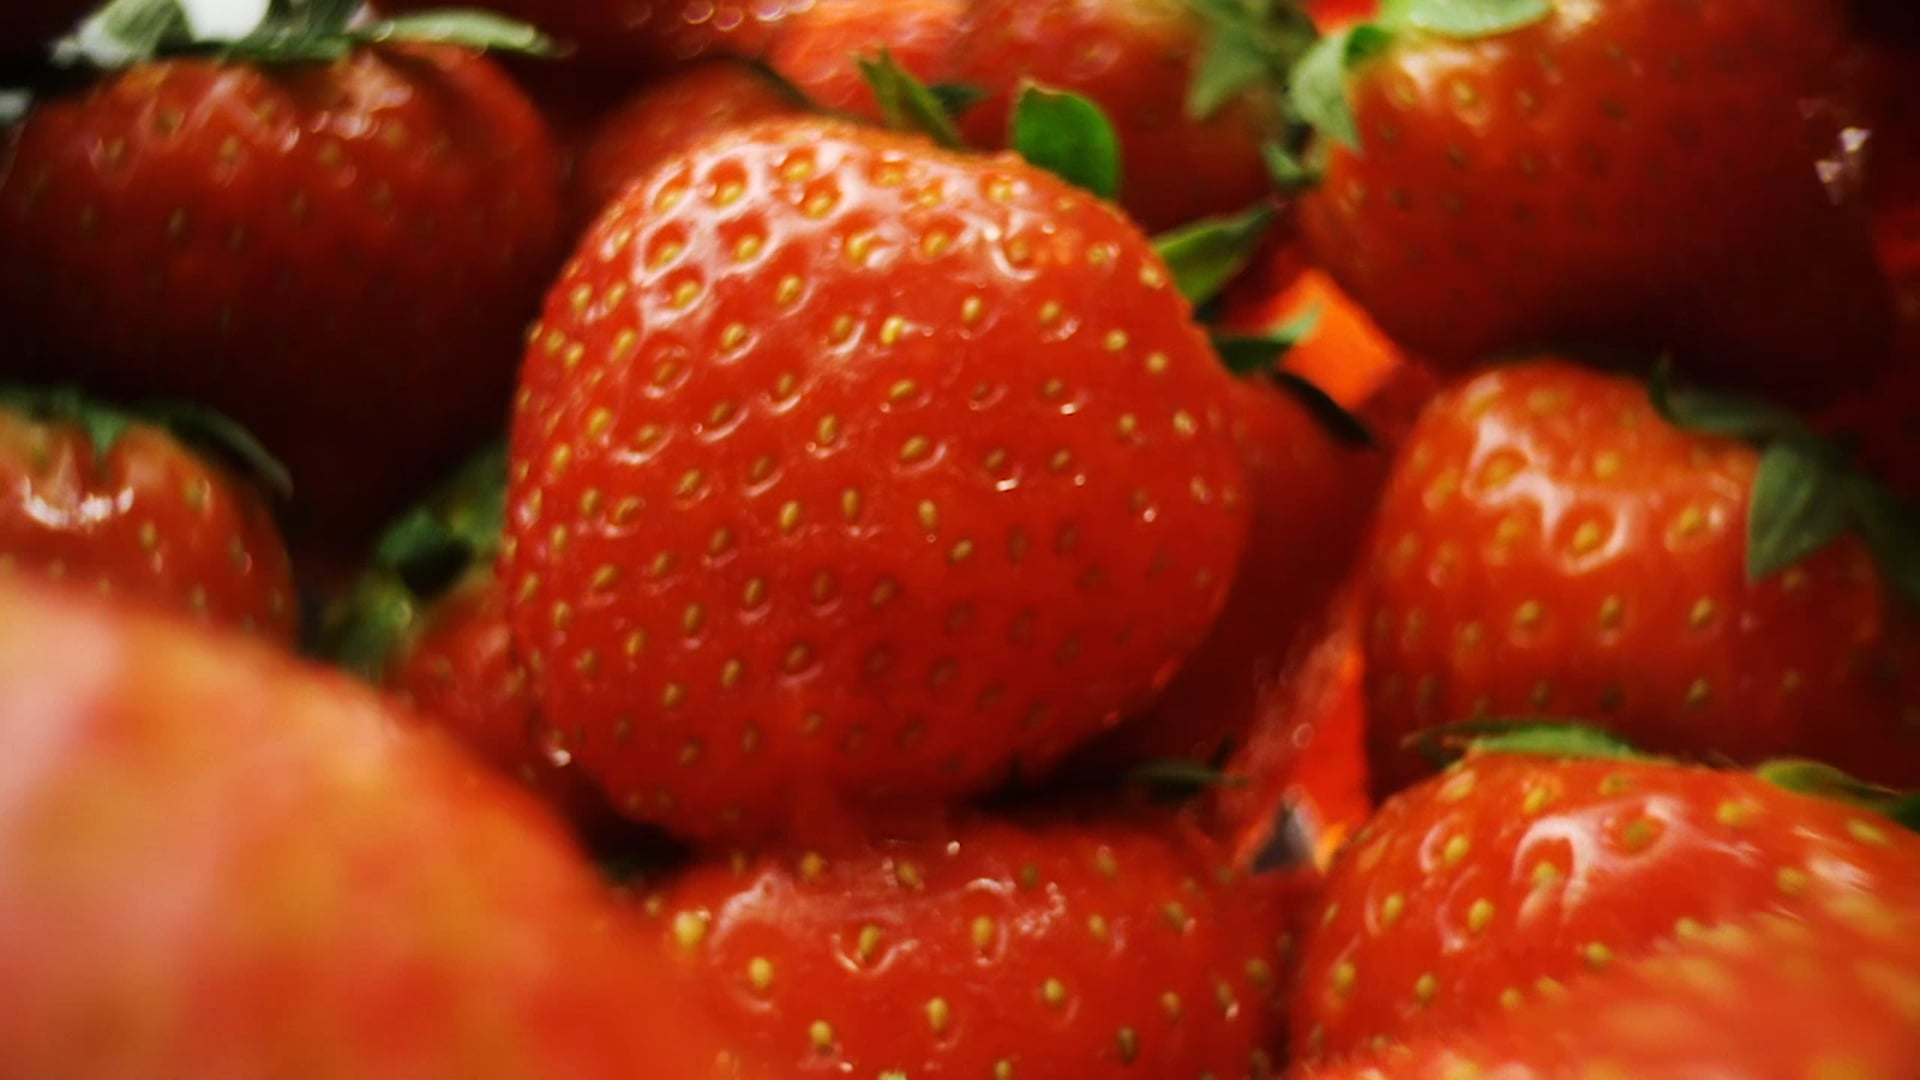 Haagen Dazs fruits travel